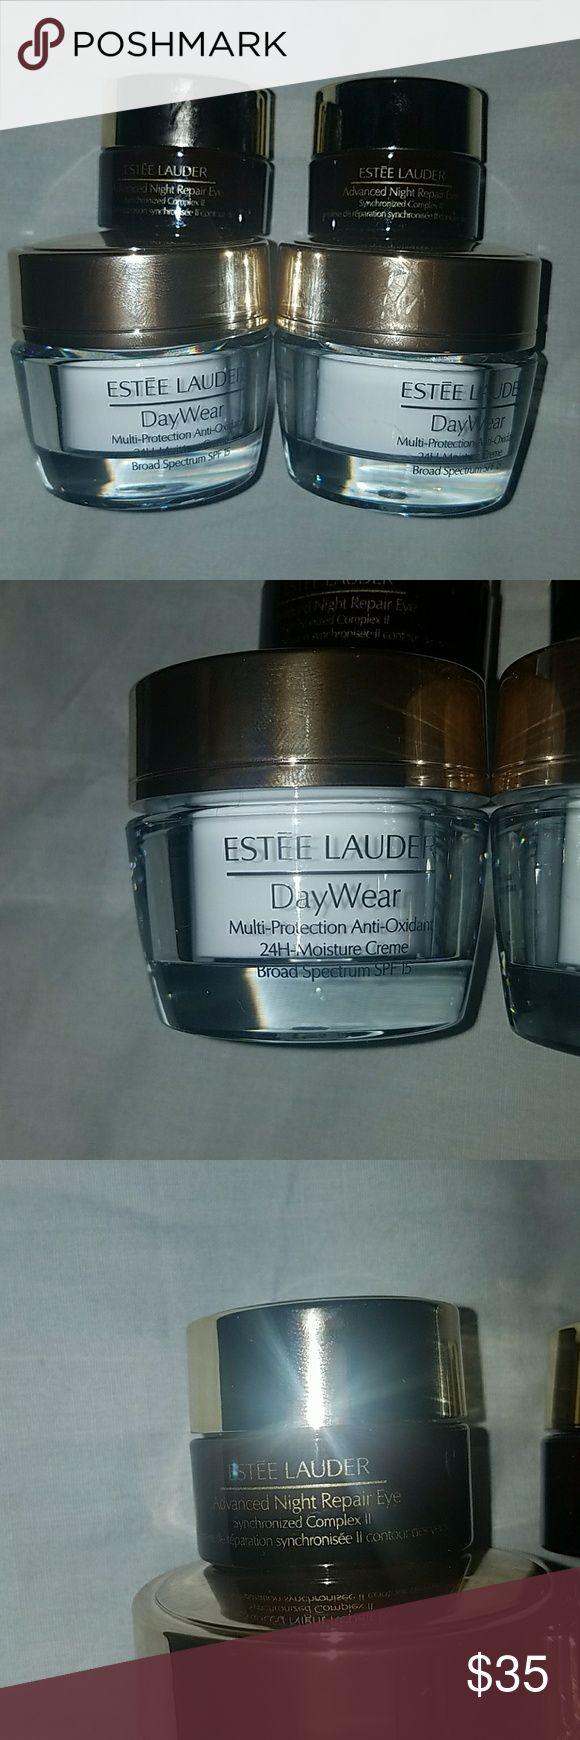 Estee Lauder face bundle New never been used  Estee Lauder face cream  2? Day wear Multi - Protection Anti - Oxidant 24h Moisture Cream spf 15 .5 oz 2 x Advanced Night Repair Eye .17 oz  No box Makeup